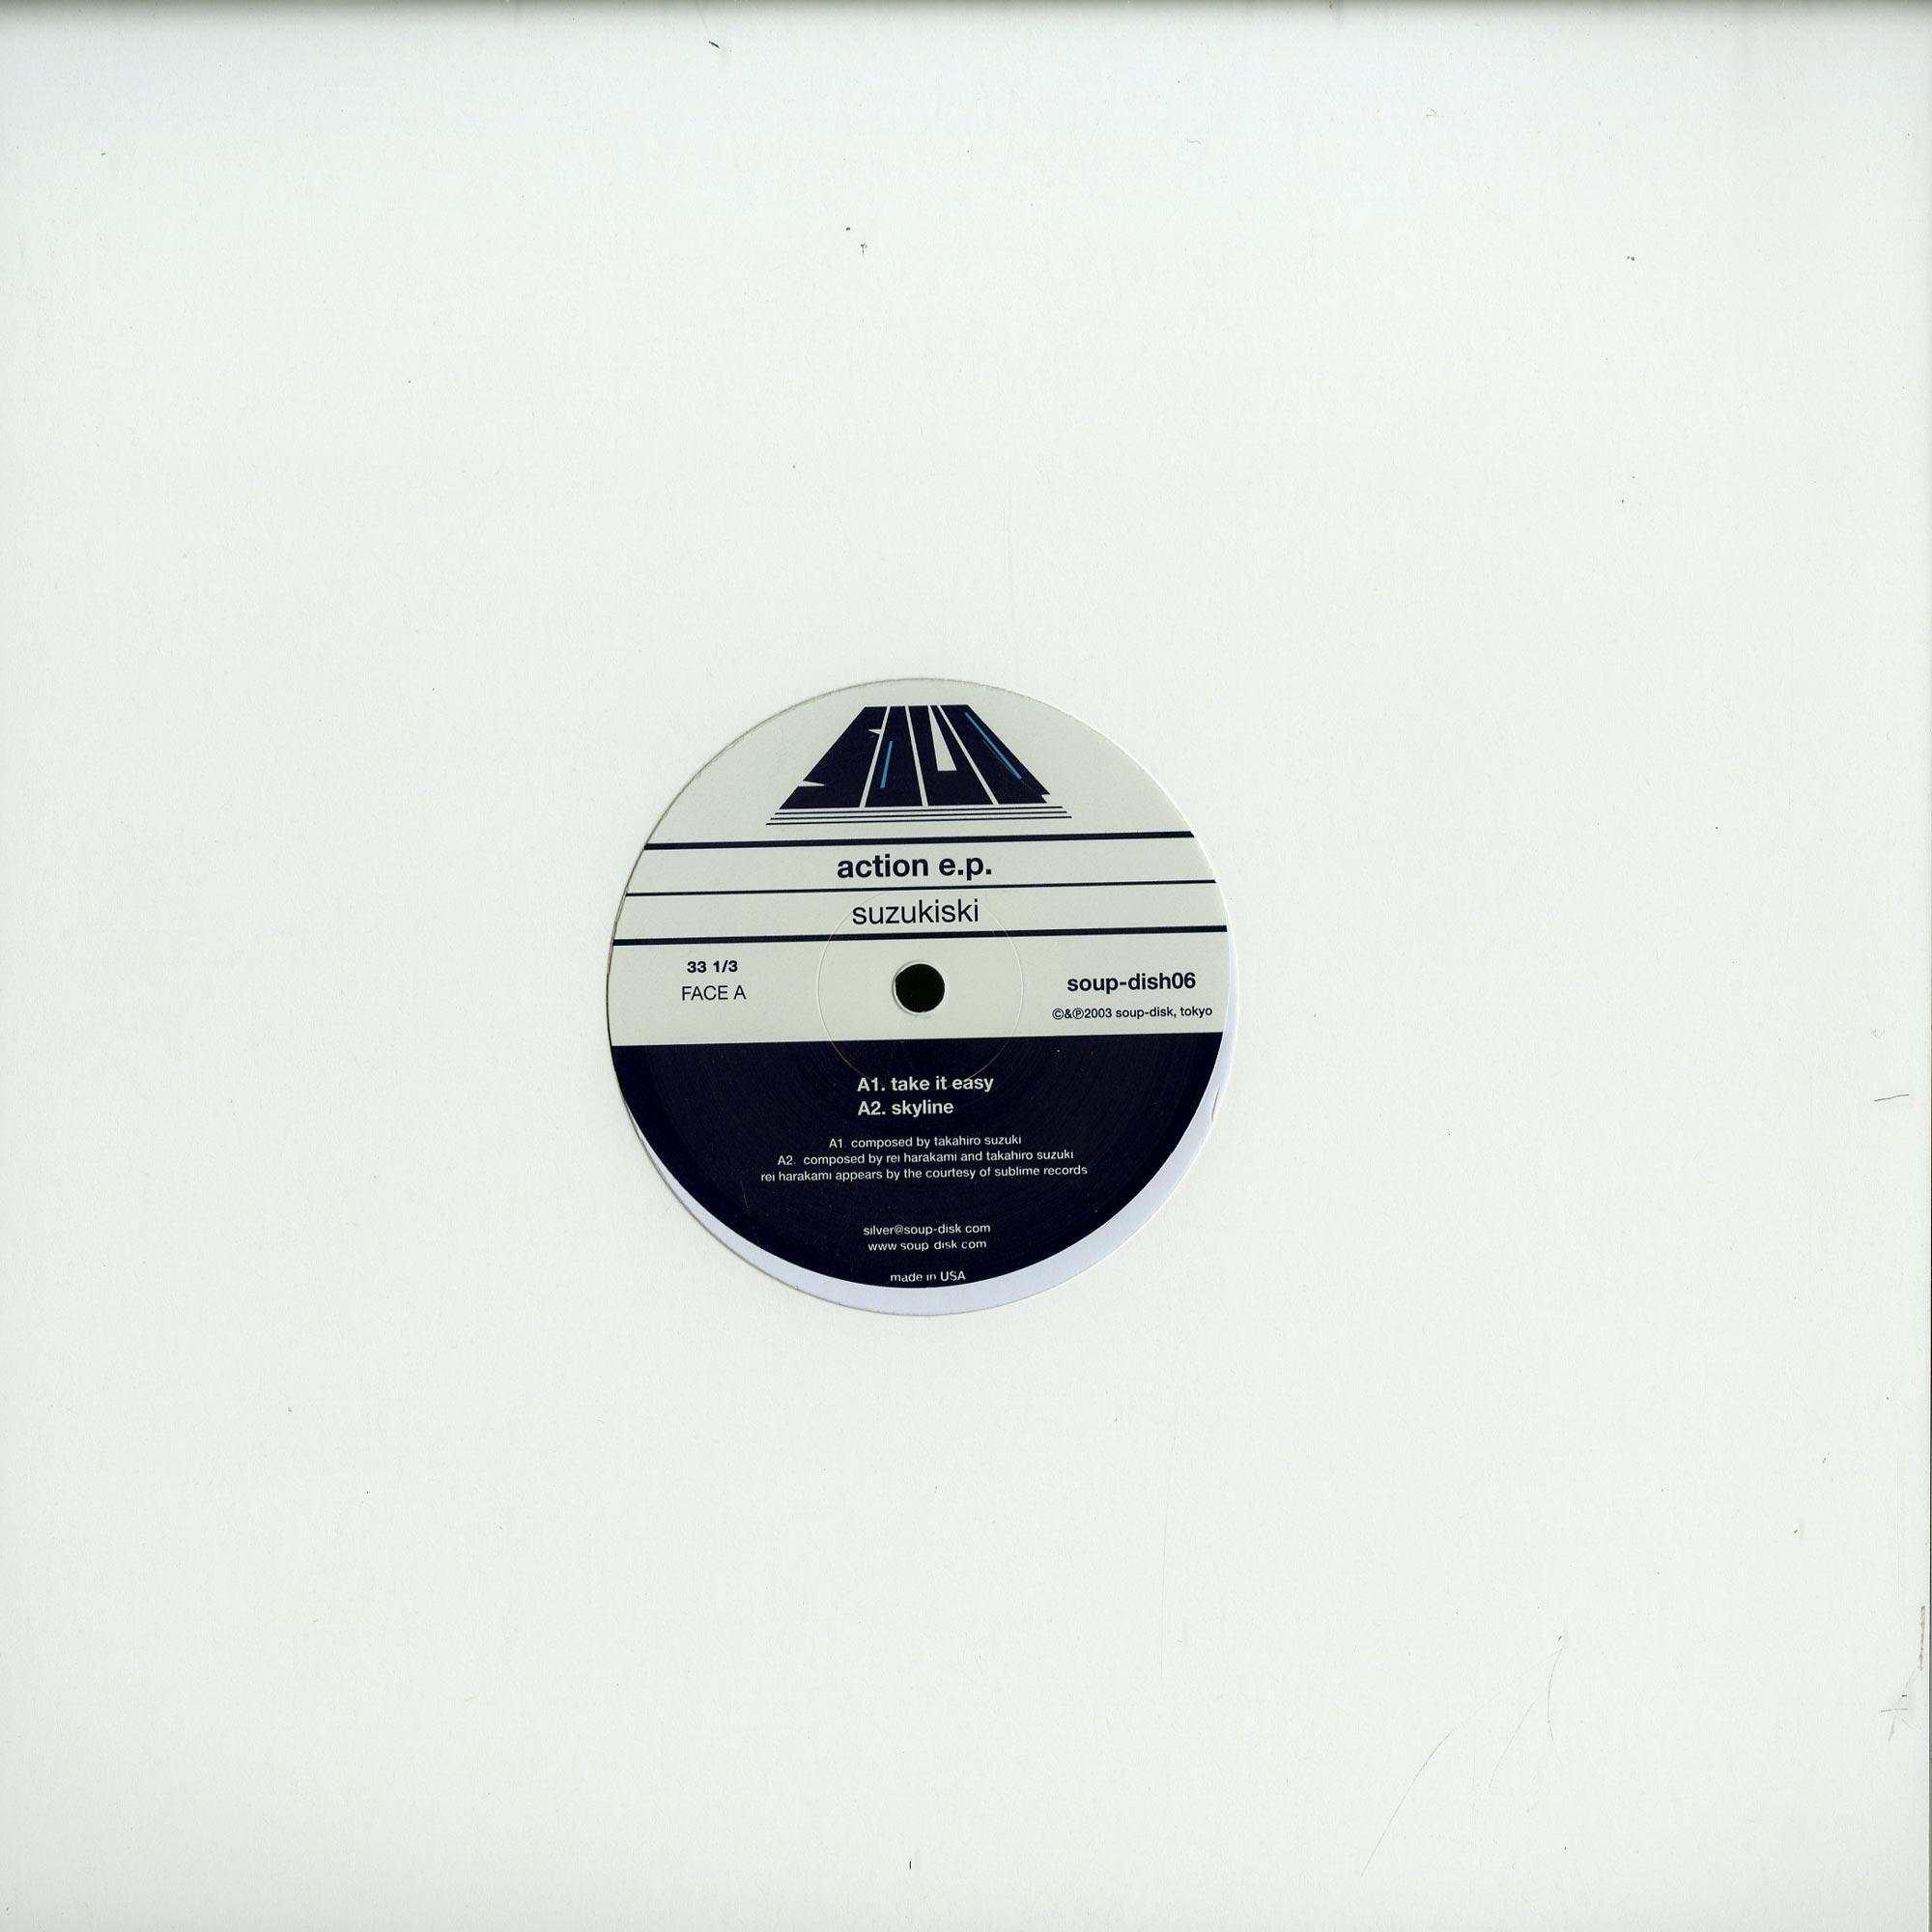 Suzukiski - ACTION EP